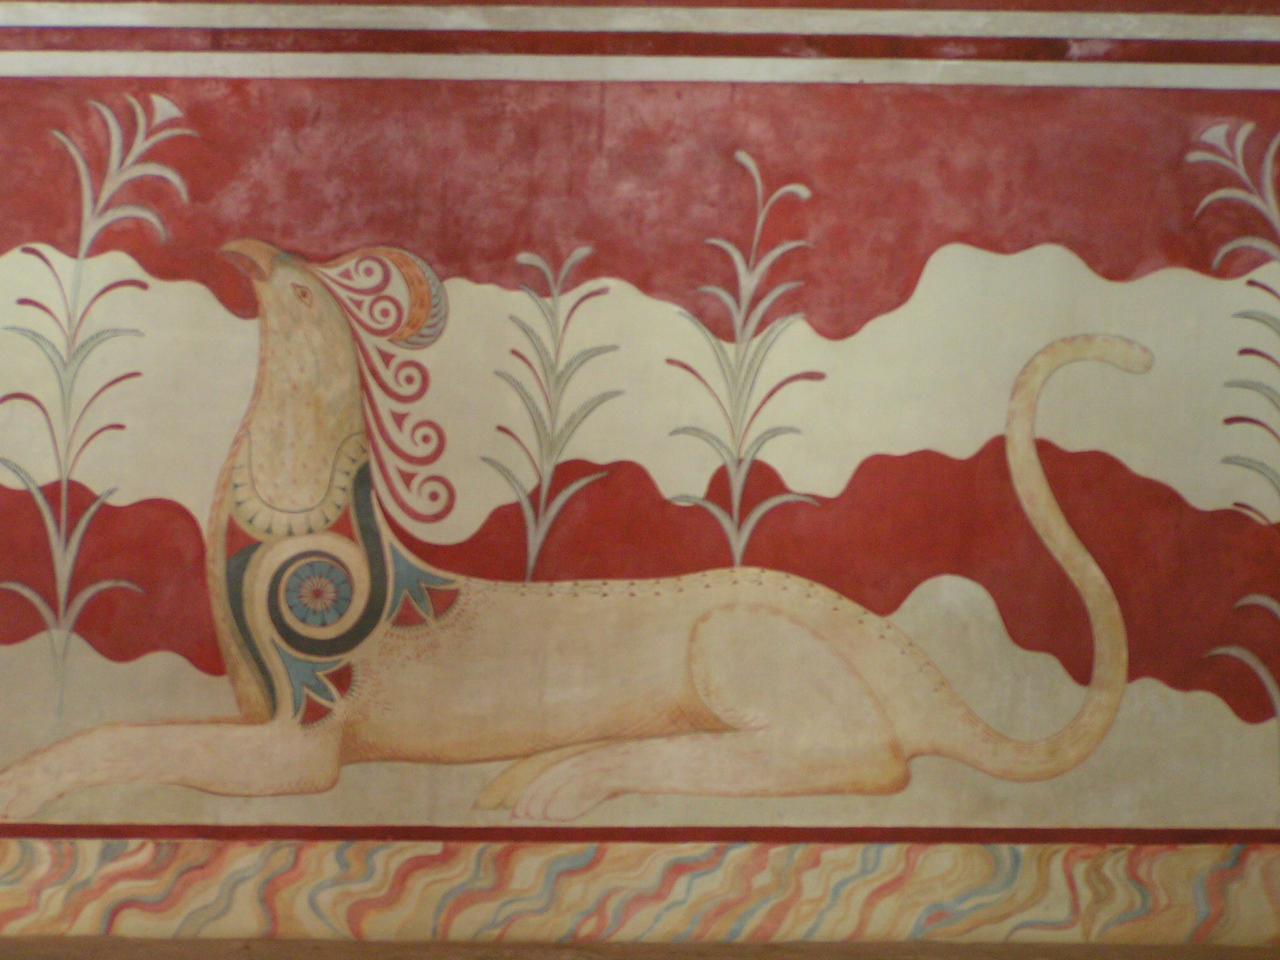 Knossos_fresco_in_throne_palace.JPG